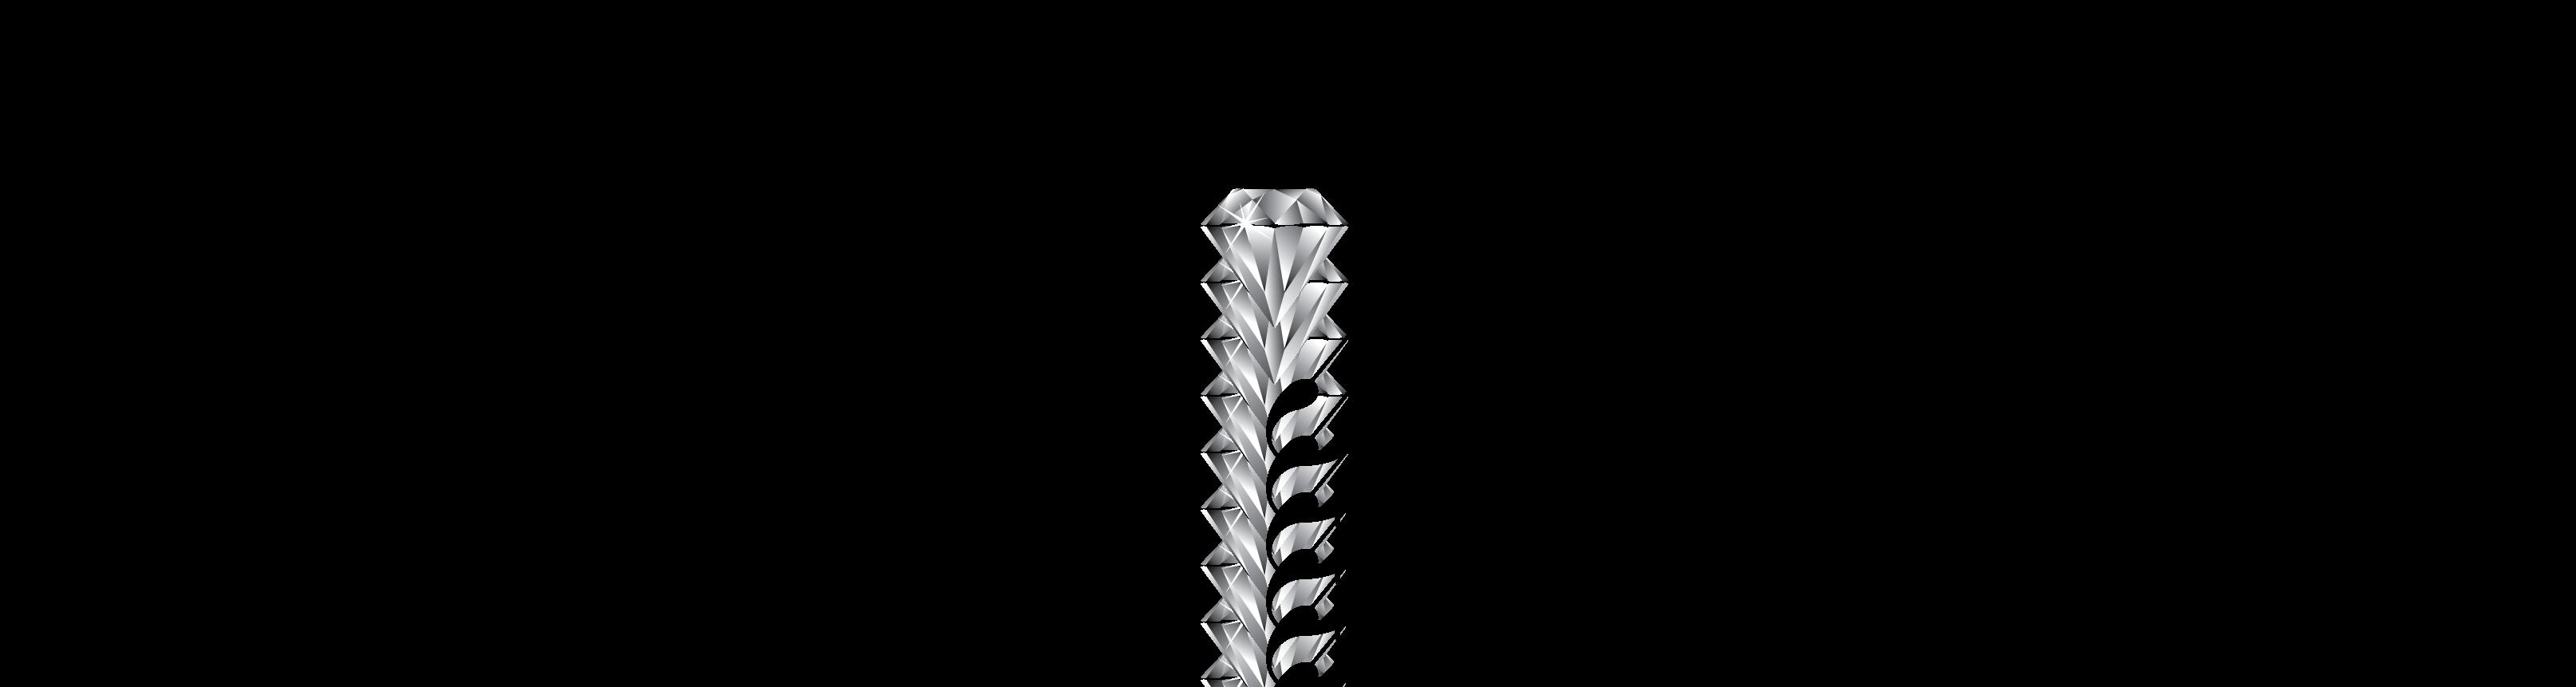 Confer's Jewelers Logo